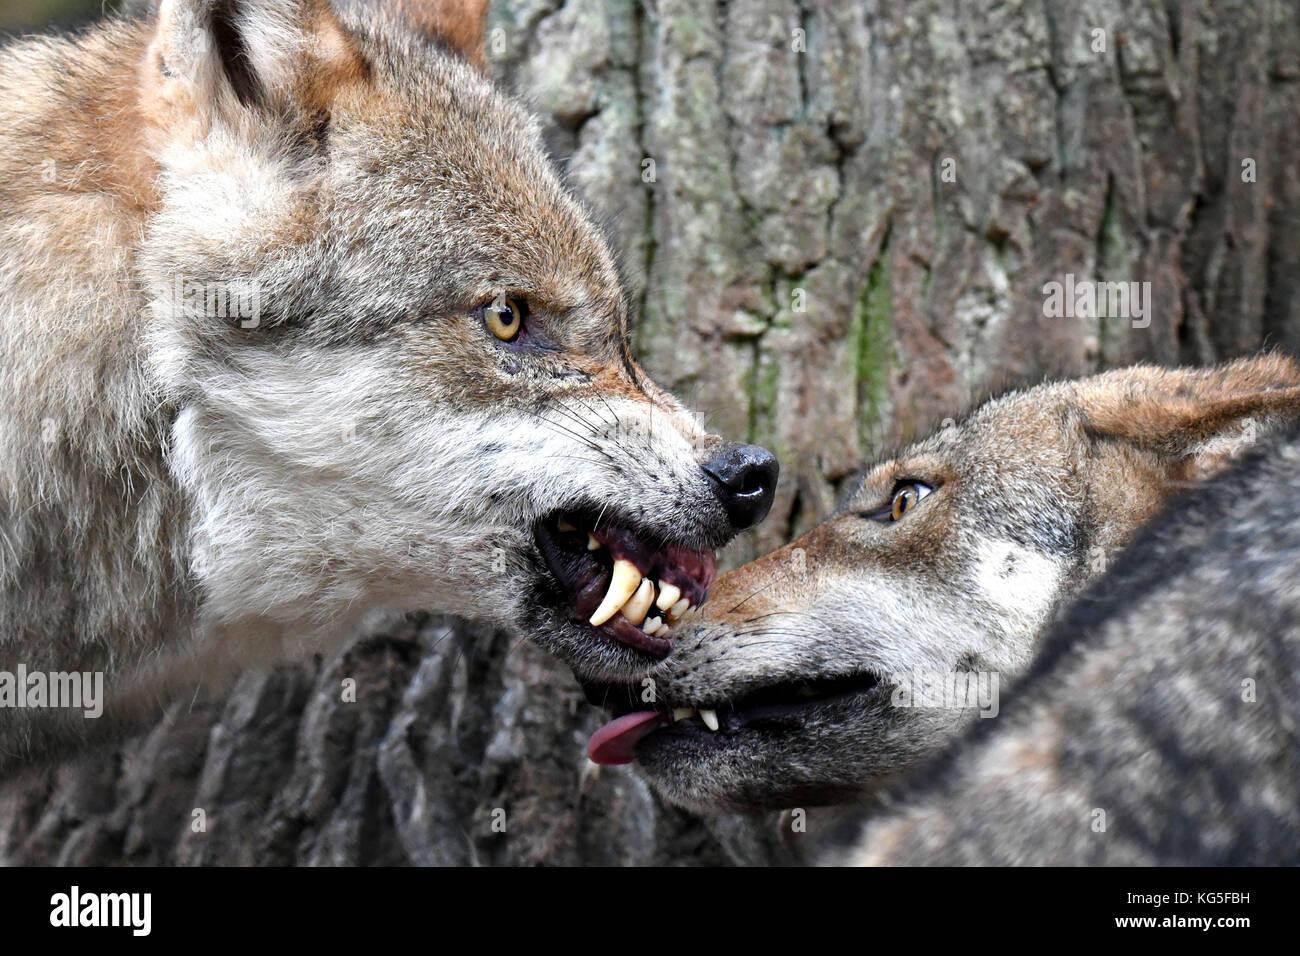 Wölfe, Canis lupus, Knurren, Zähne, bedrohliche Geste. Stockbild